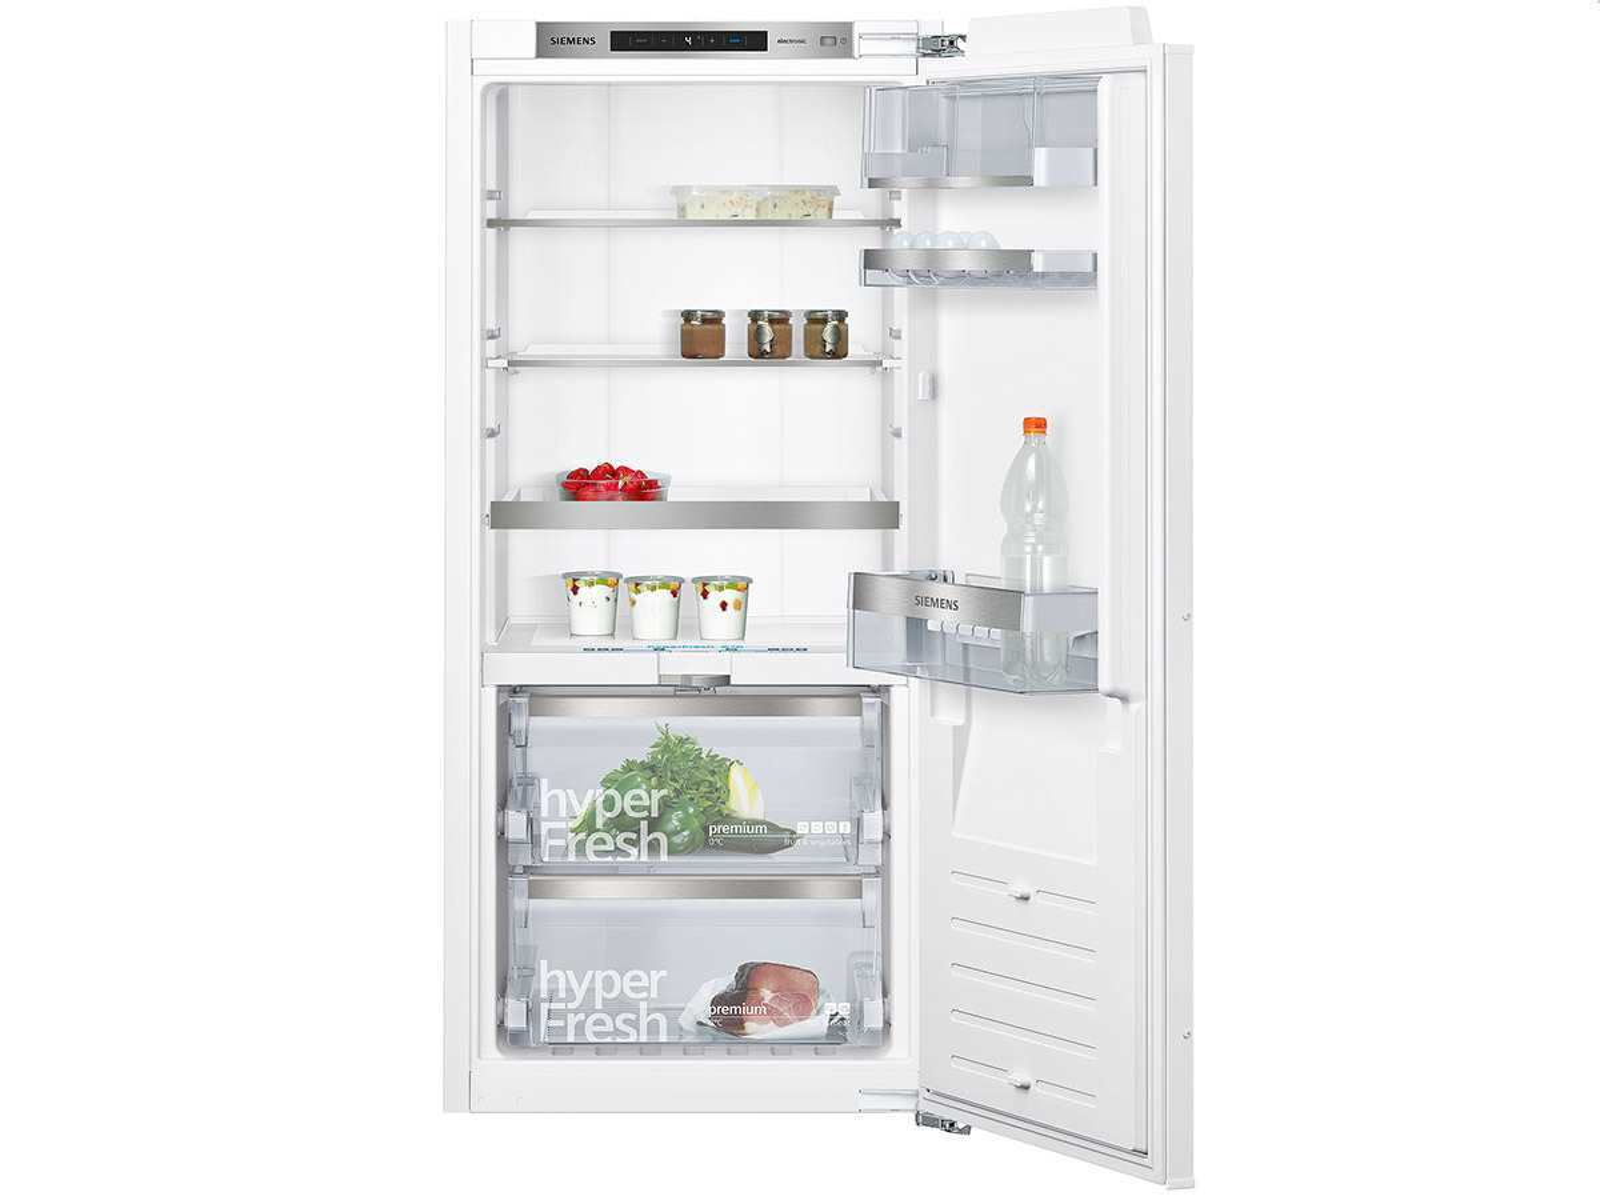 Siemens KI41FAD40 Einbaukühlschrank